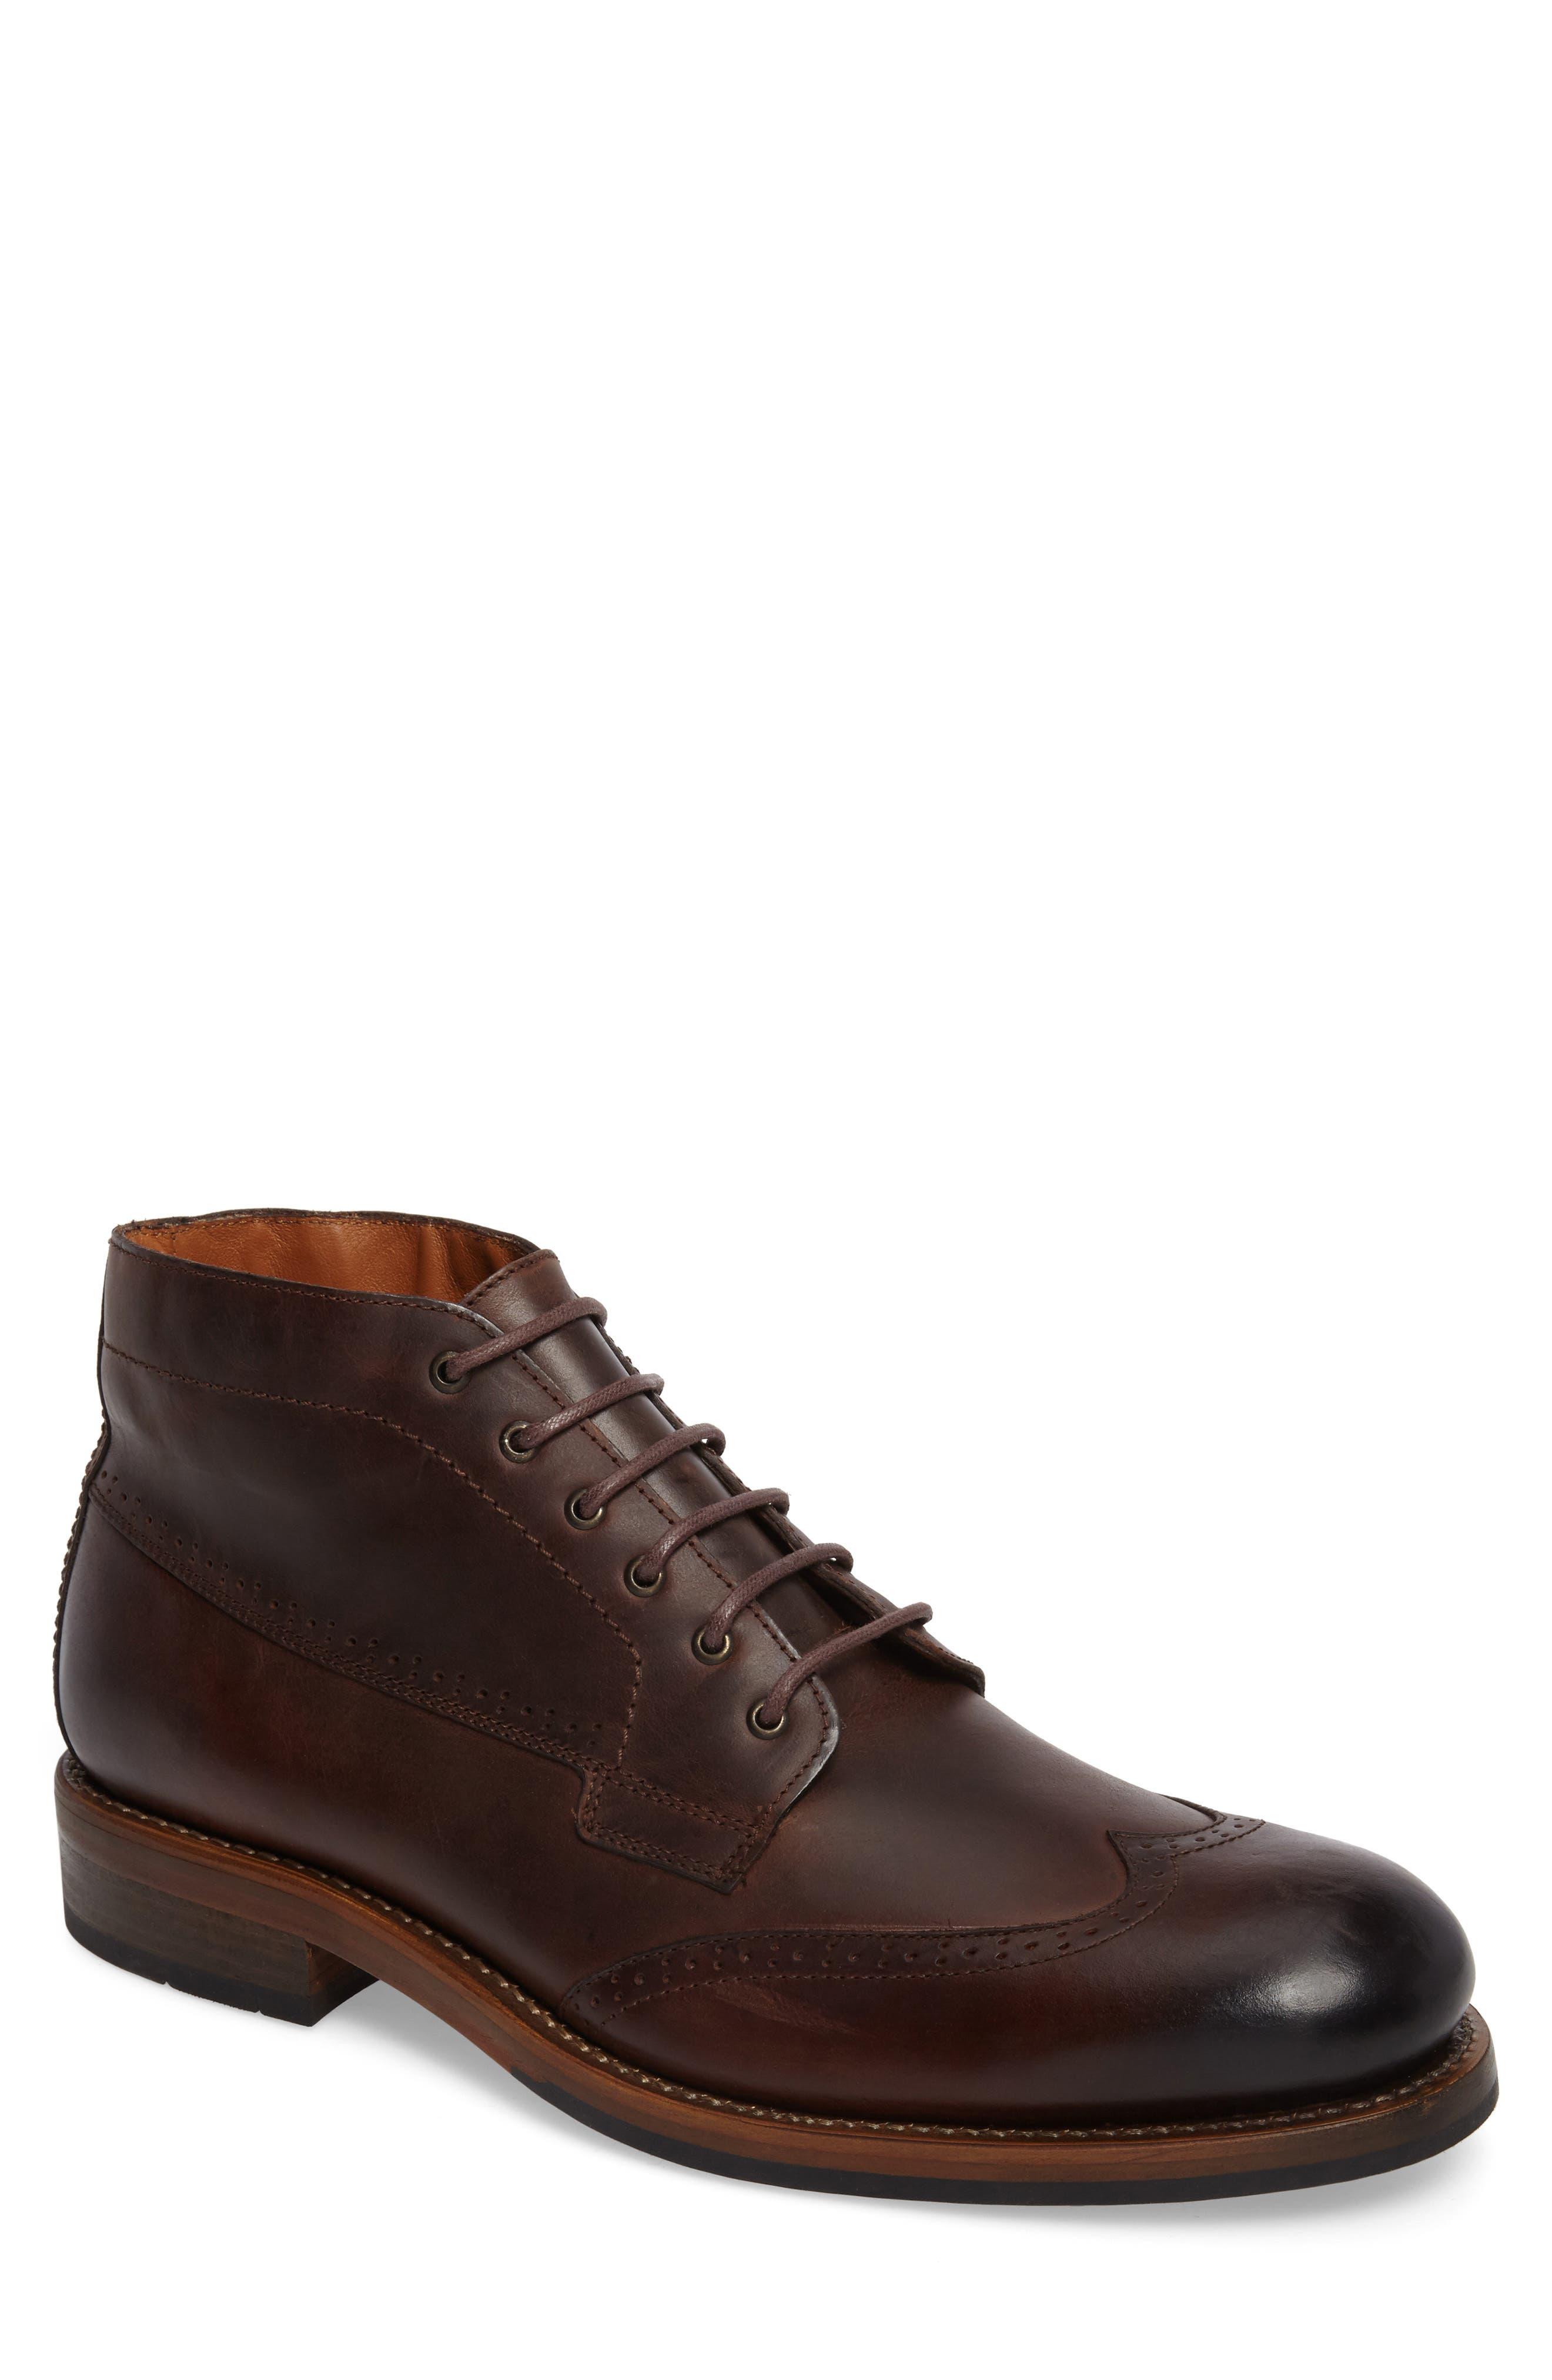 Wolverine Harwell Wingtip Boot, Brown